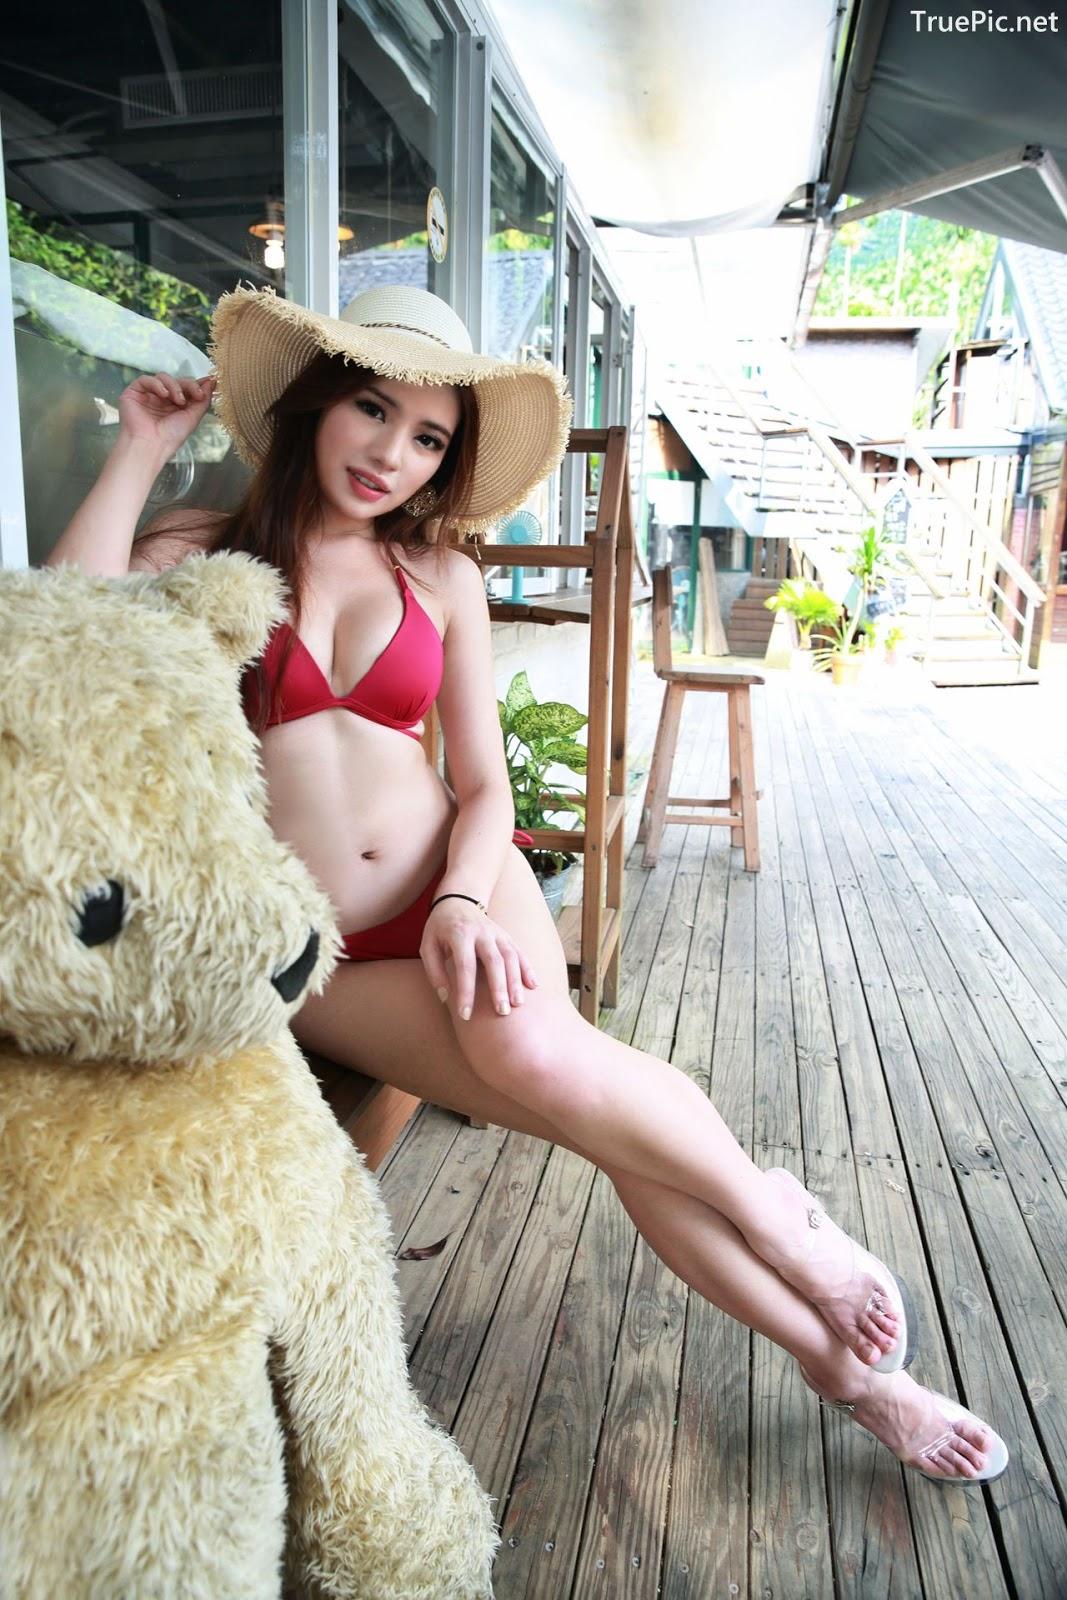 Image-Taiwanese-Model-Kiki-謝立琪-Lovely-And-Beautiful-Bikini-Girl-TruePic.net- Picture-7